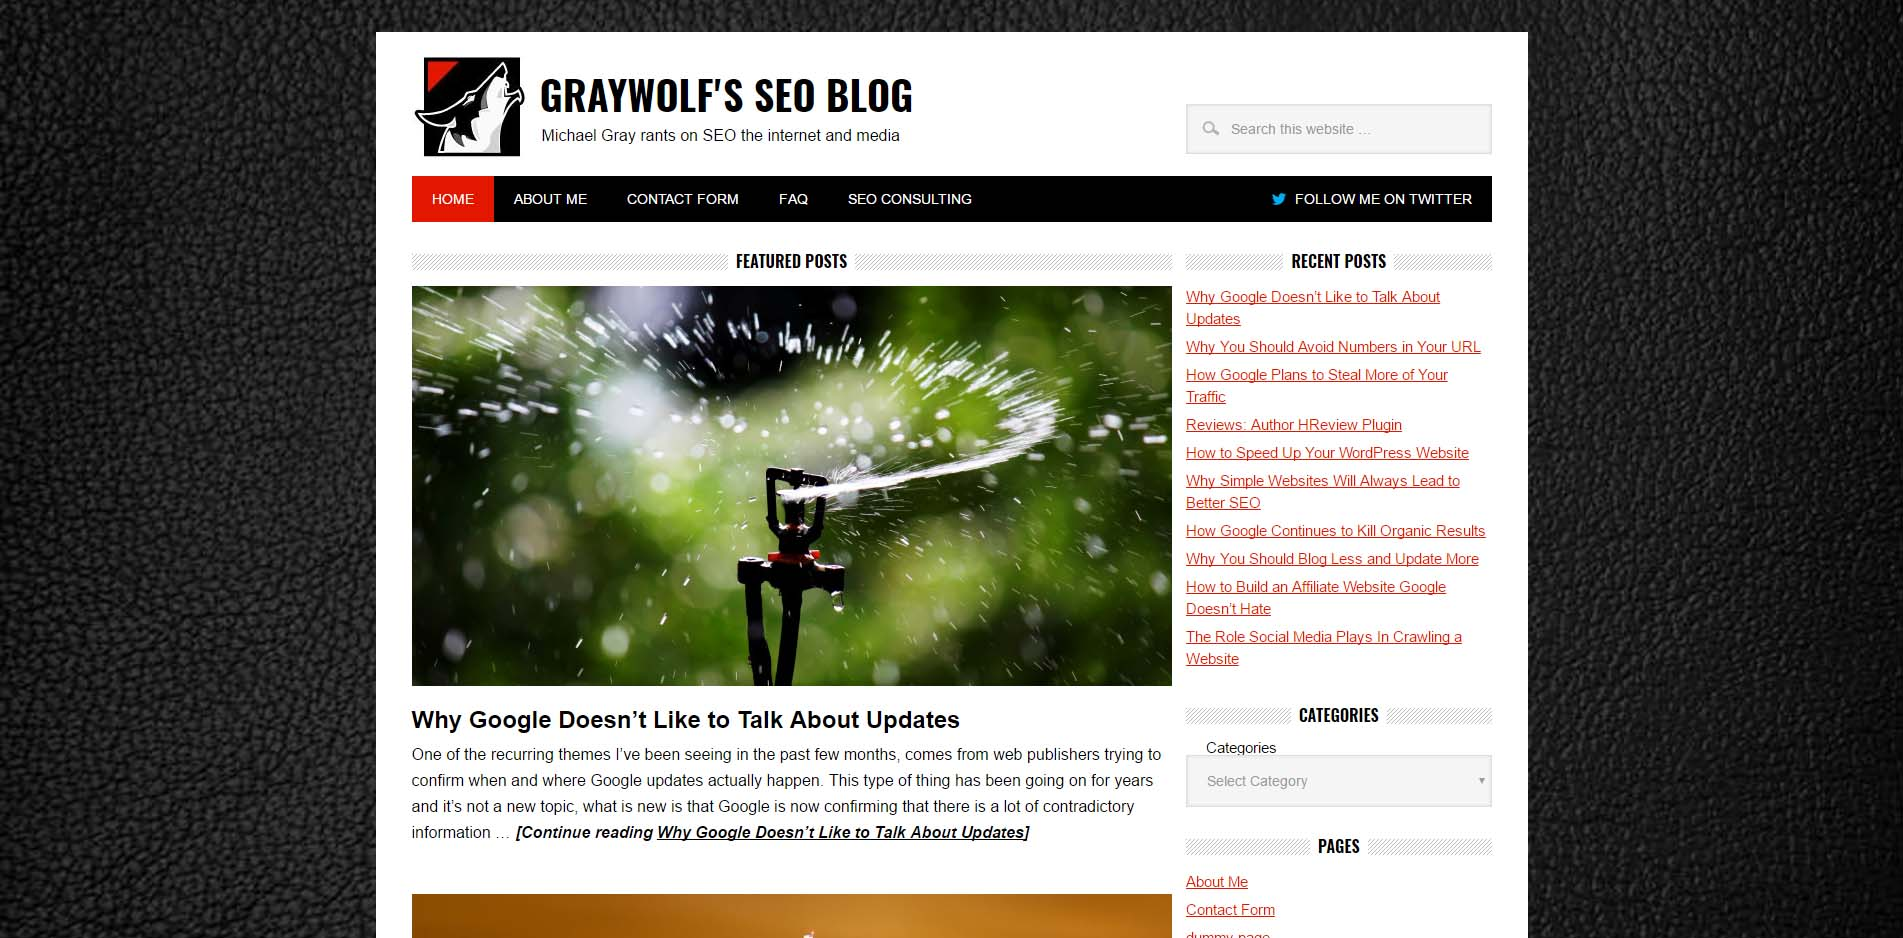 seo-blog-graywolfseo-com